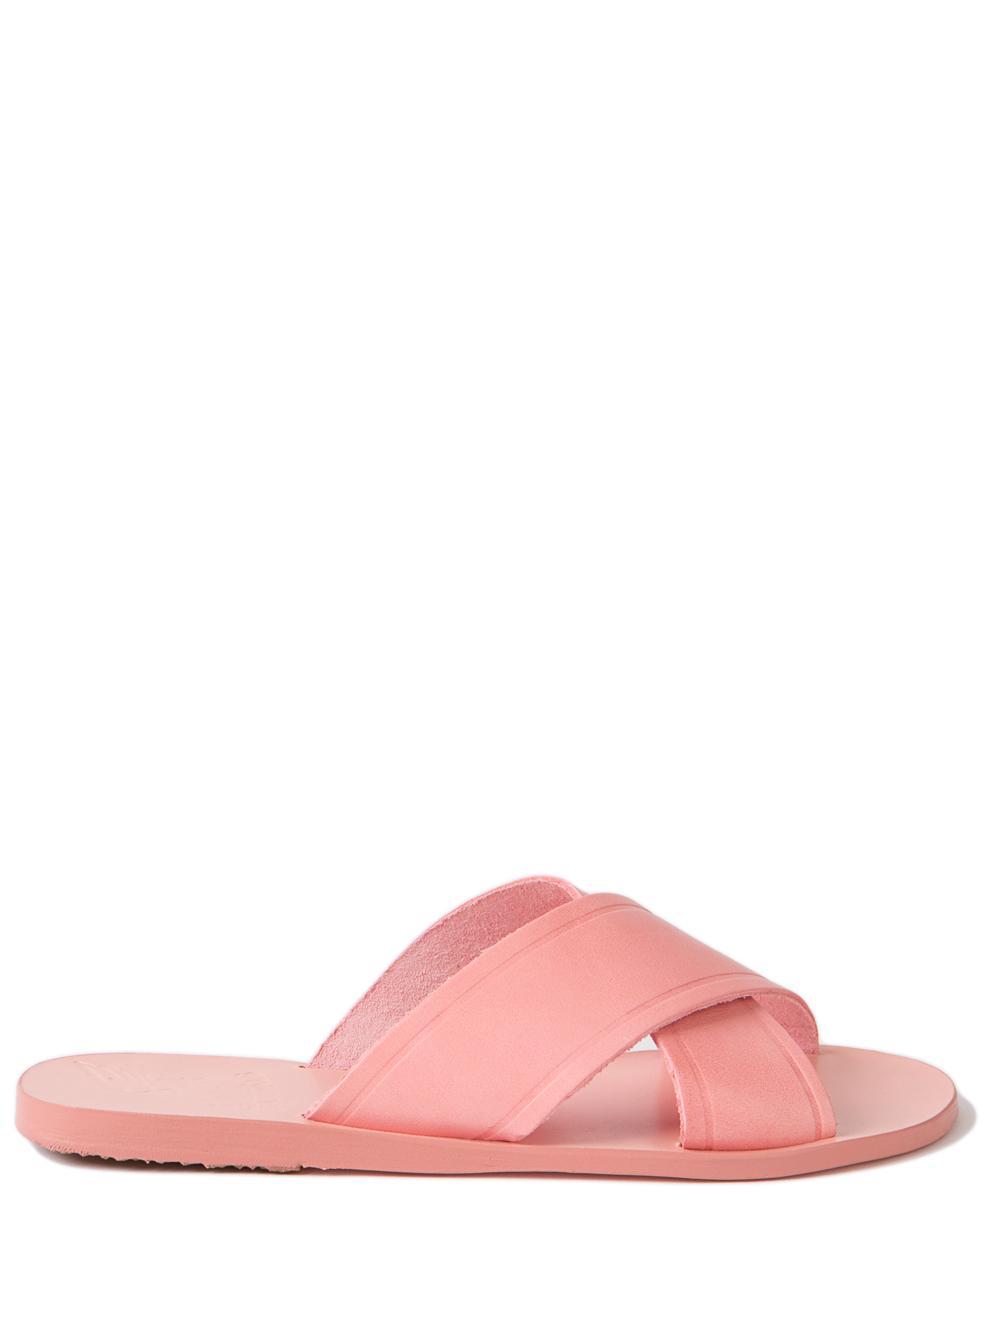 ancient sandals slides in pink lyst